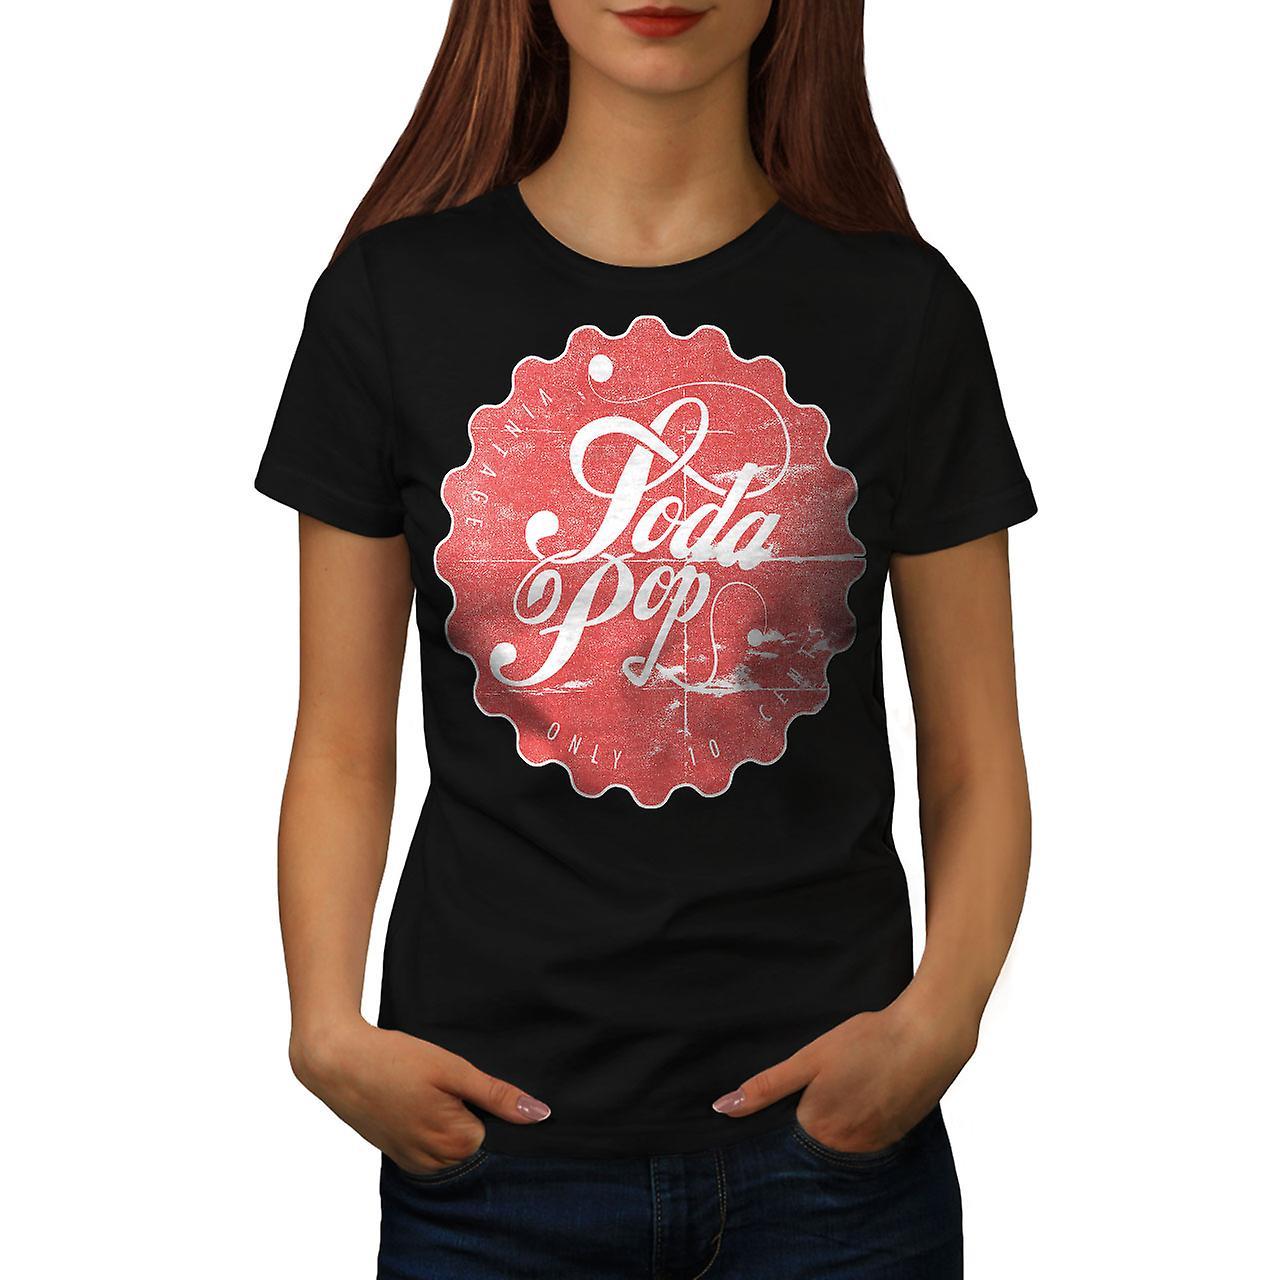 Soda Pop Drink Vintage Women Black T-shirt | Wellcoda